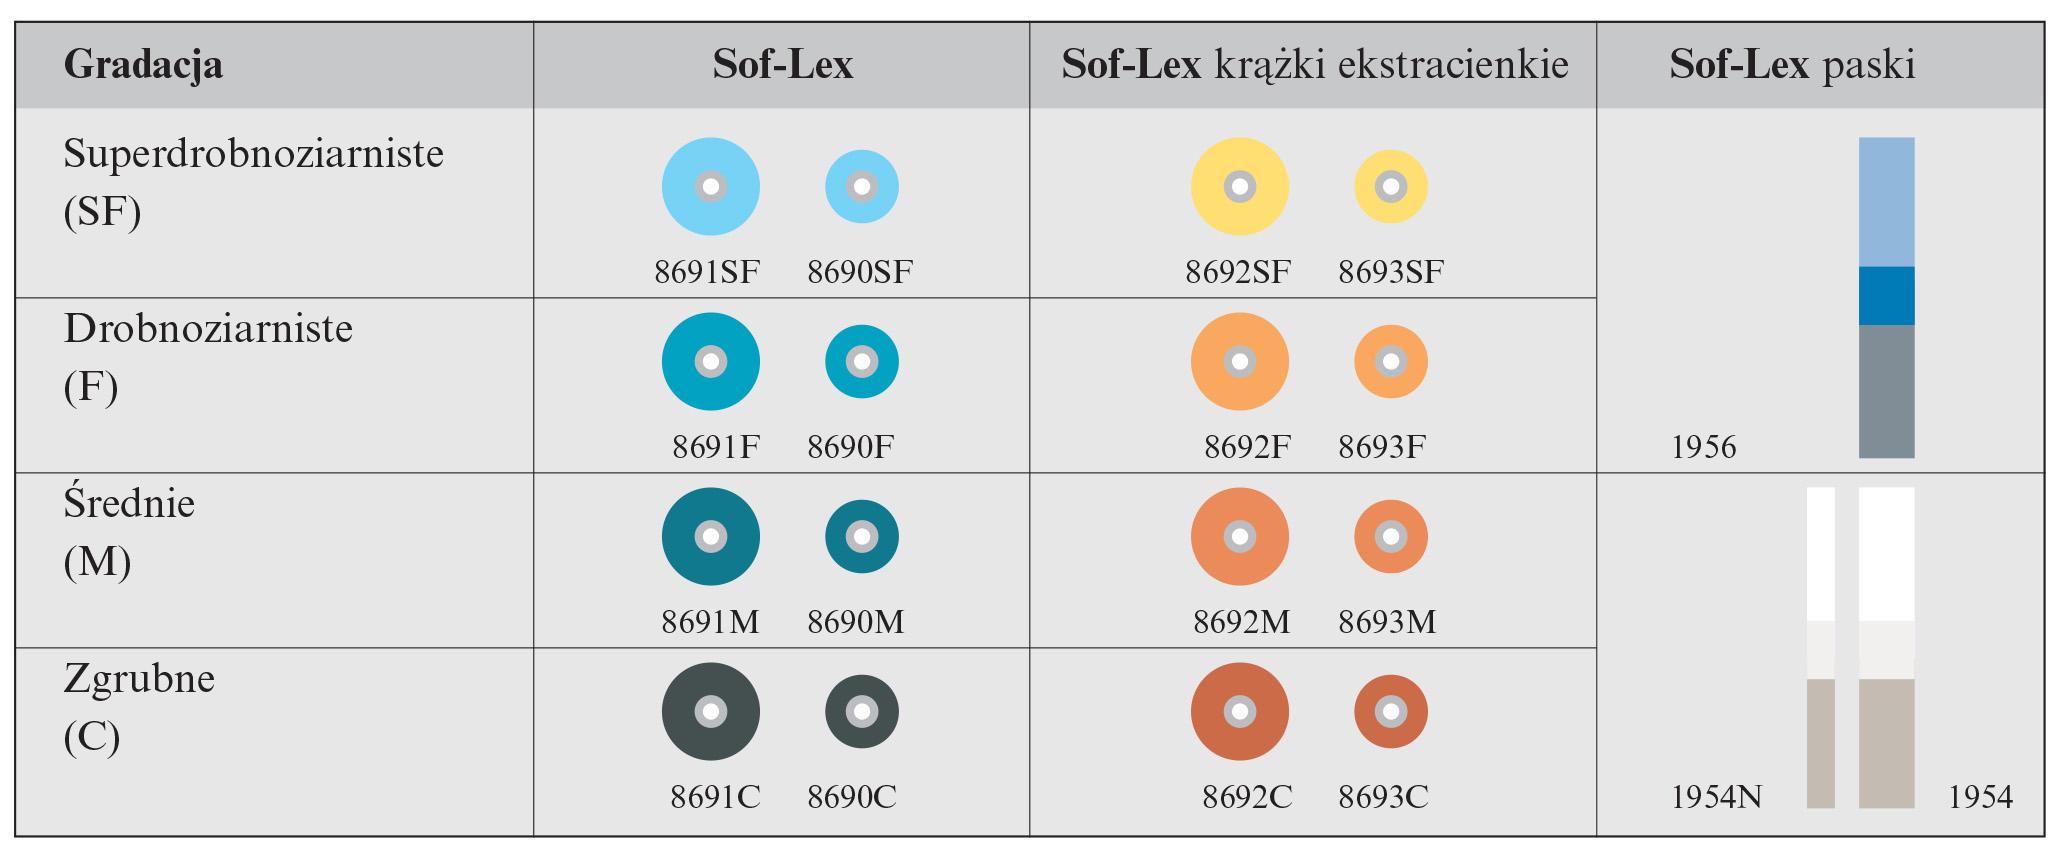 sof-lex